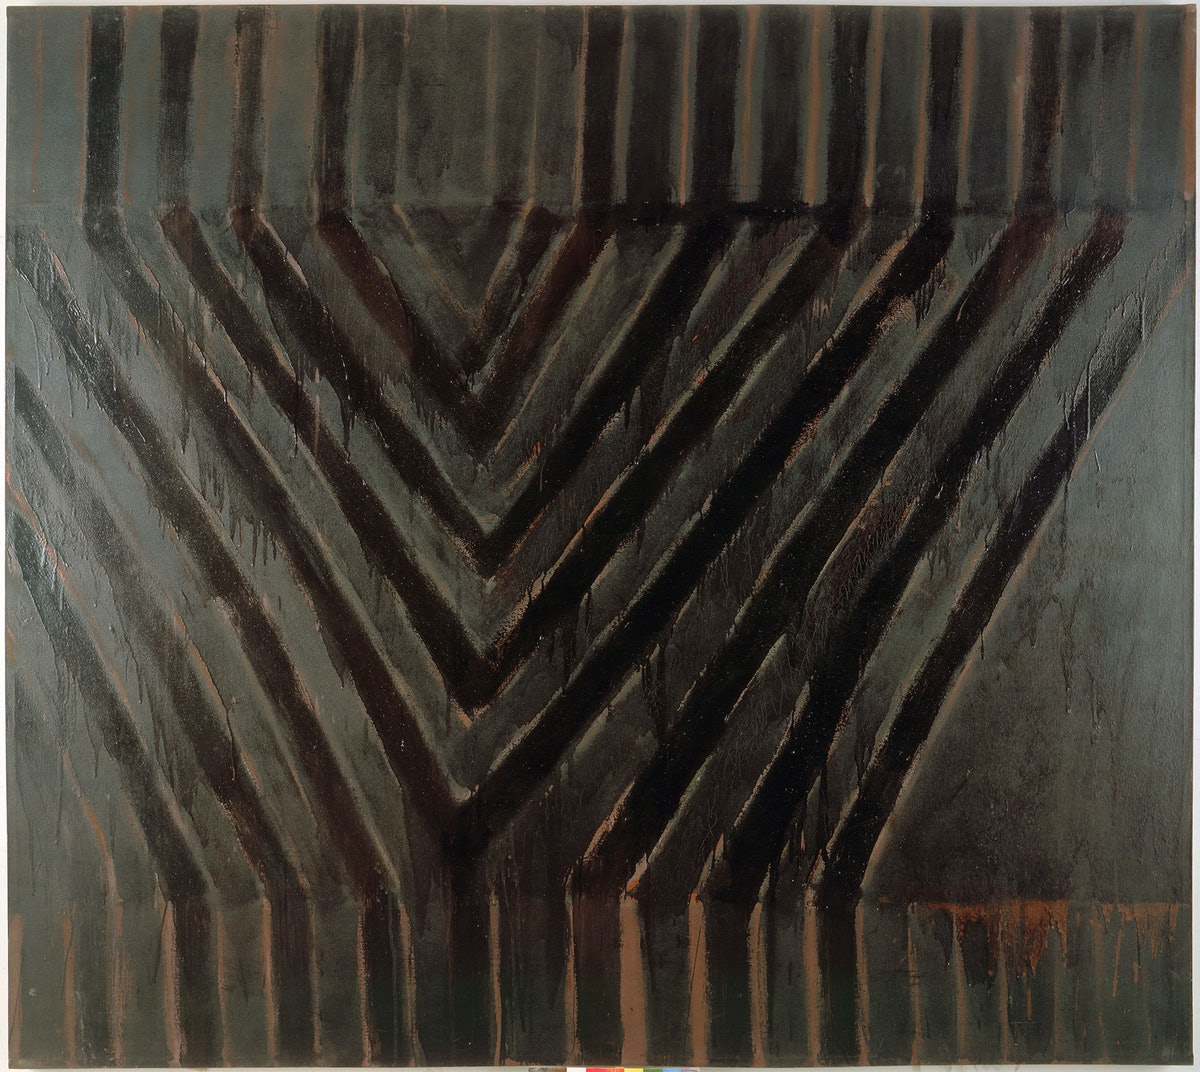 Frank Stella's Delta